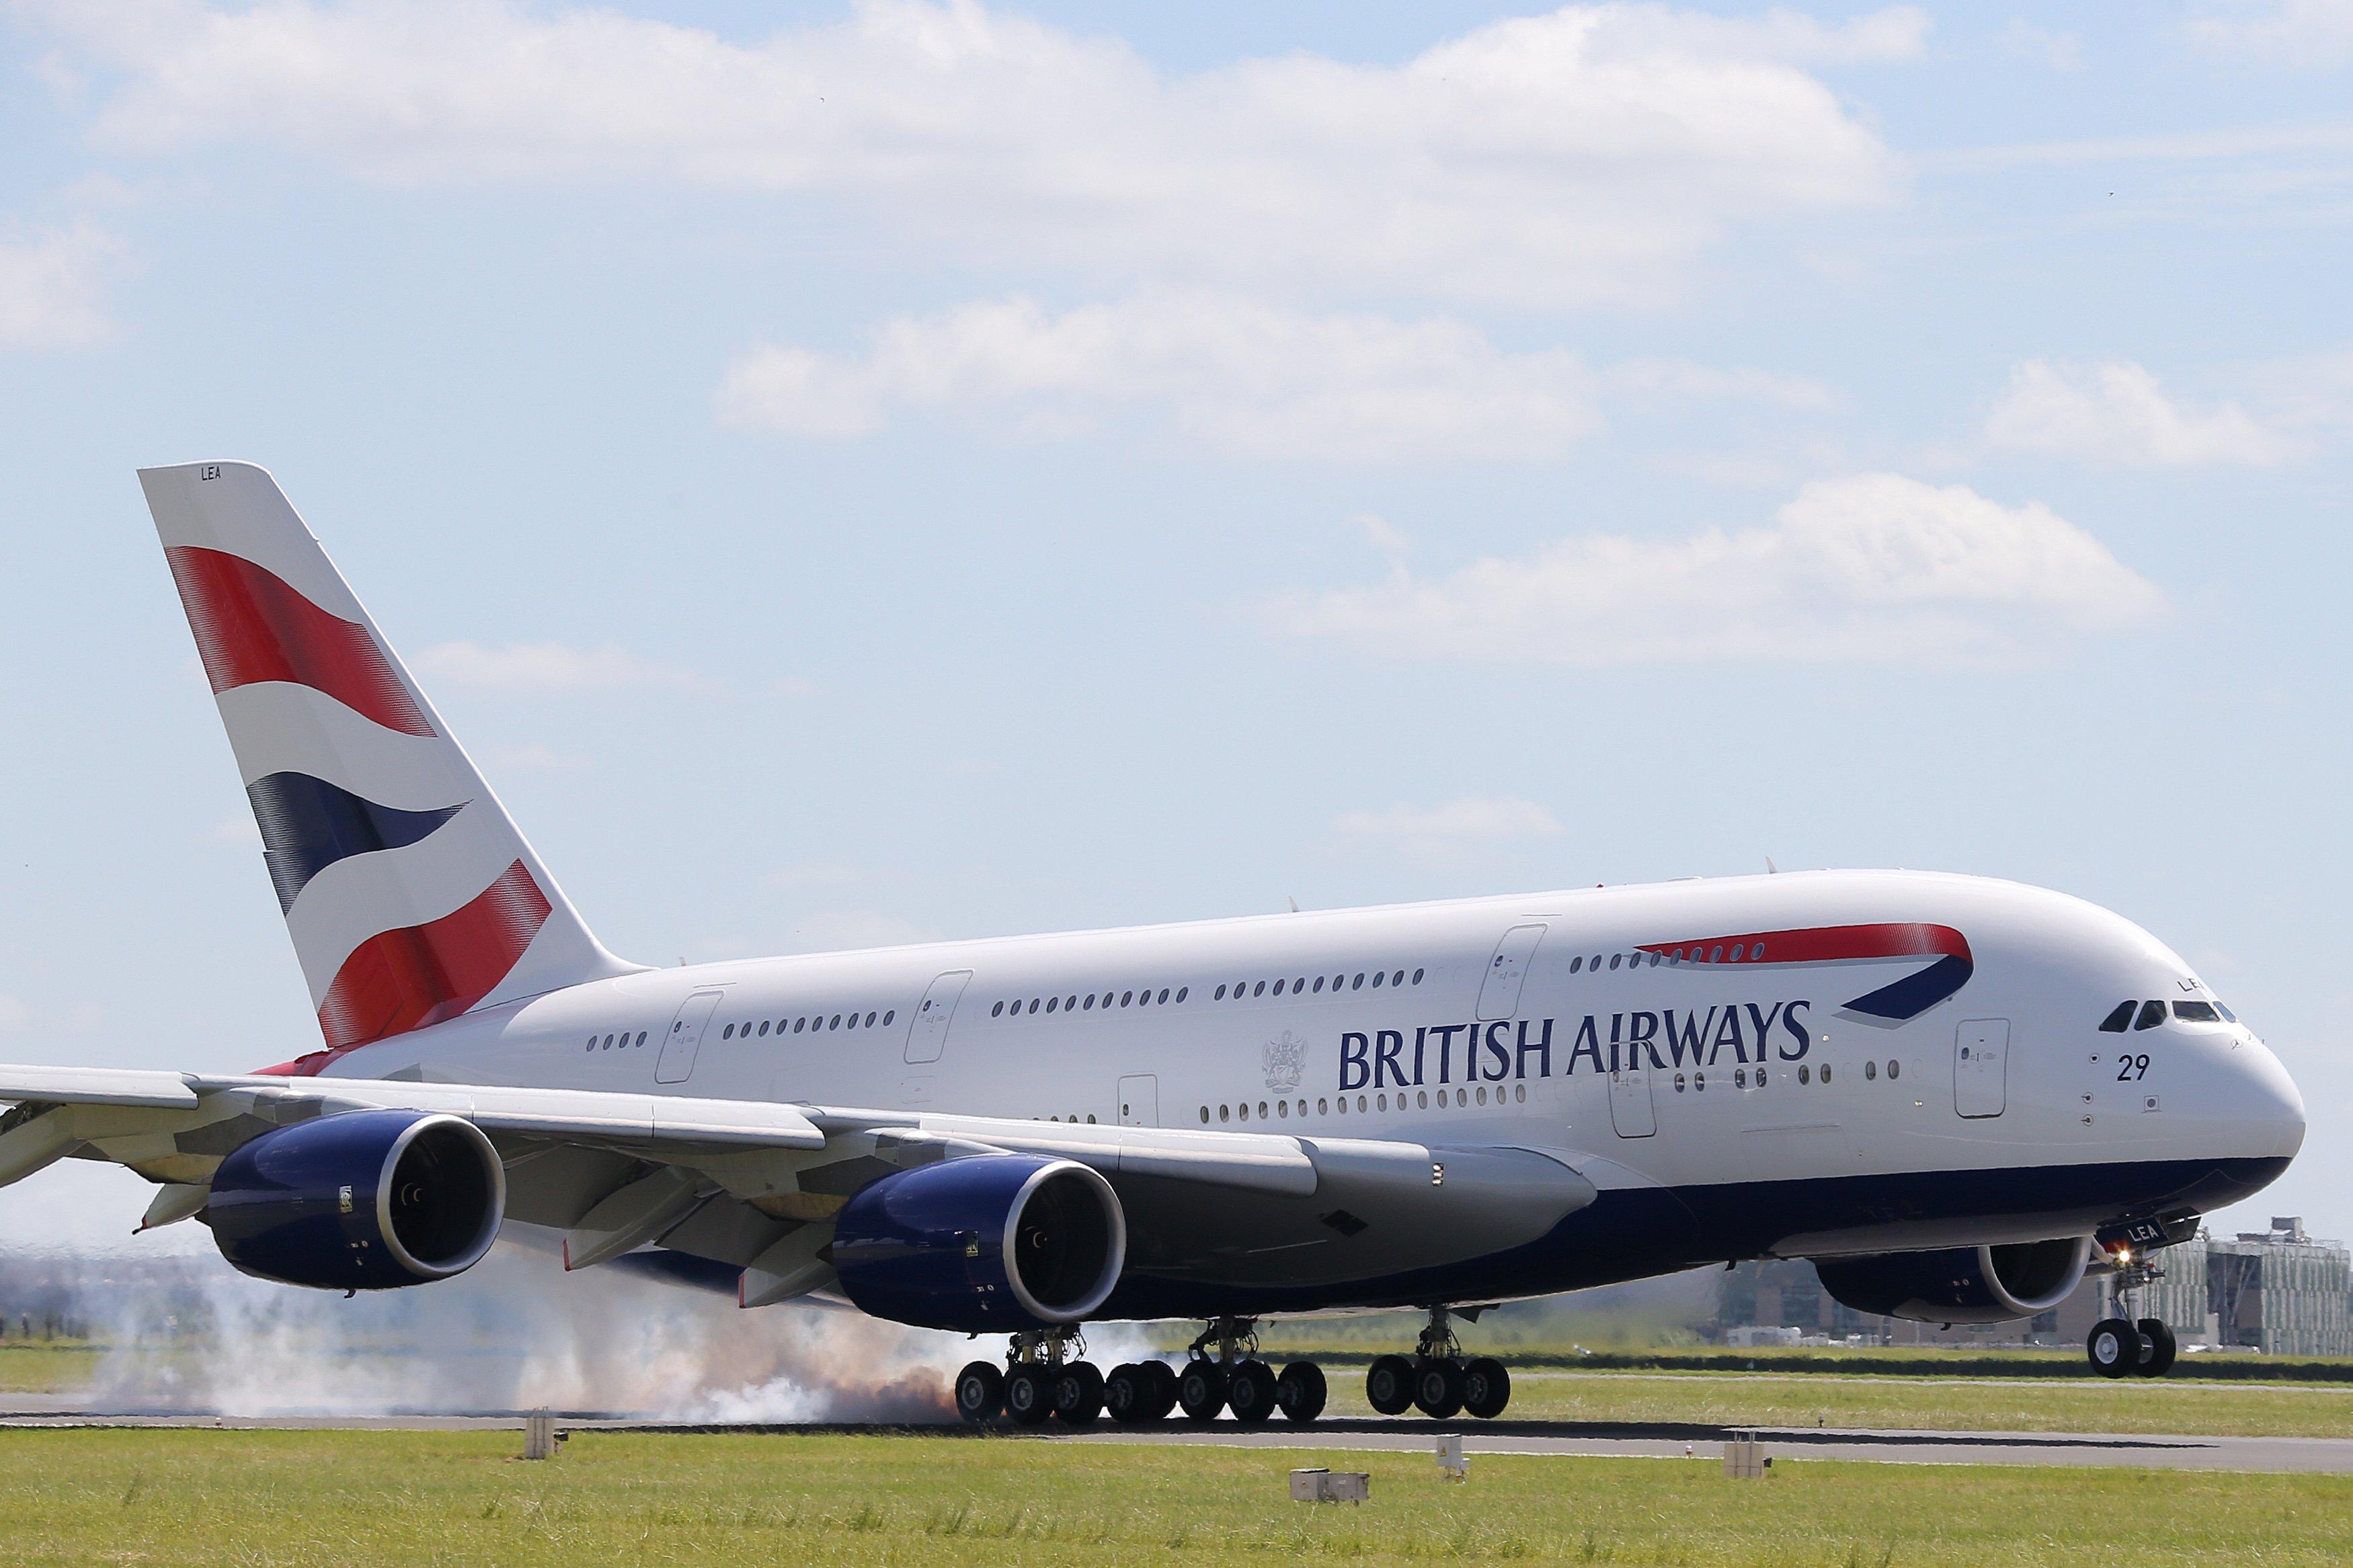 Terceiro dia de problemas nos voos da British Airways